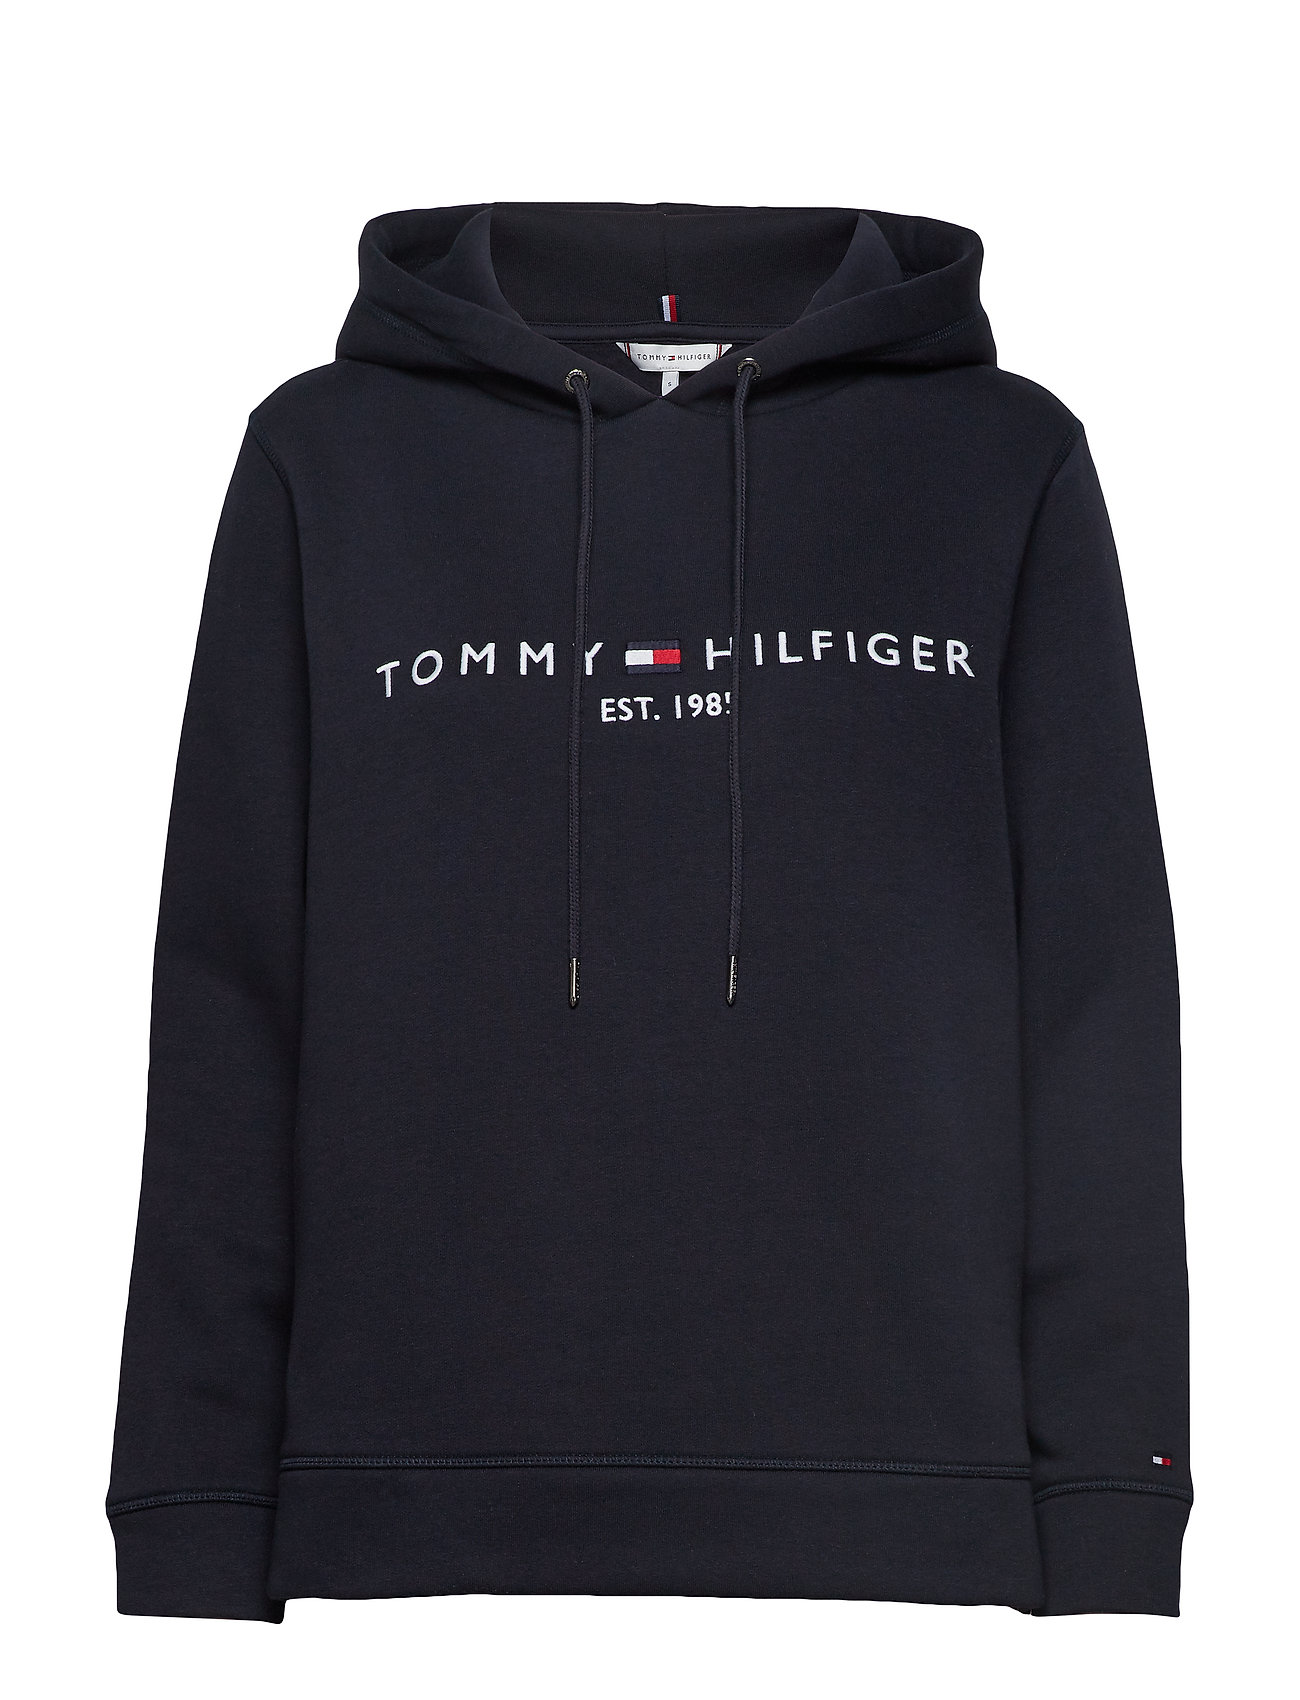 Tommy Hilfiger TH ESS HILFIGER HOODIE LS - SKY CAPTAIN